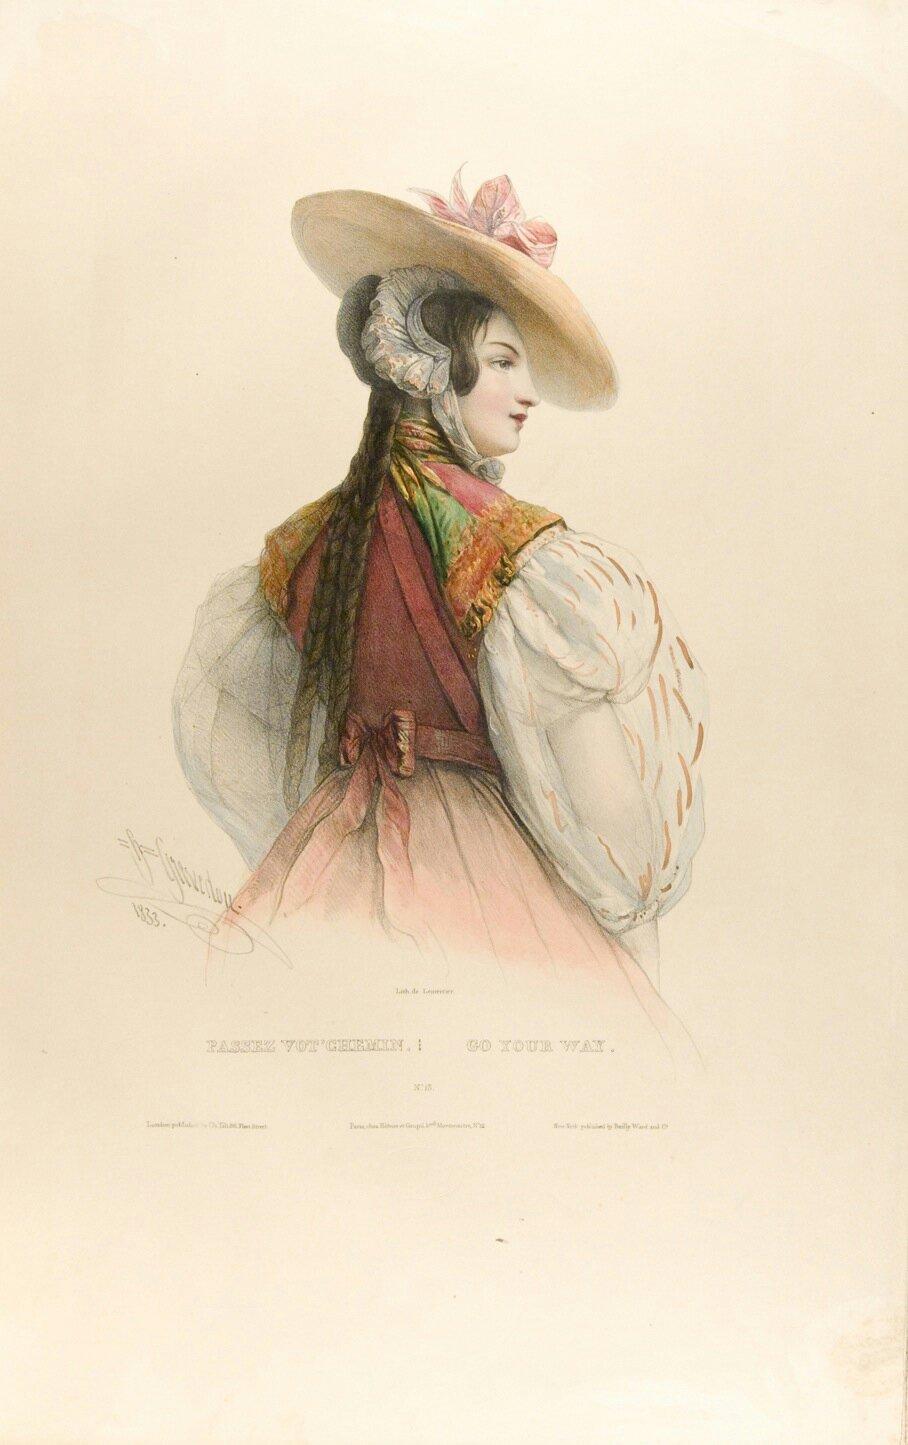 14-grevedon-vocabulaire-des-dames-1832-no-13-go-your-way-clark-tiff304460120.jpg